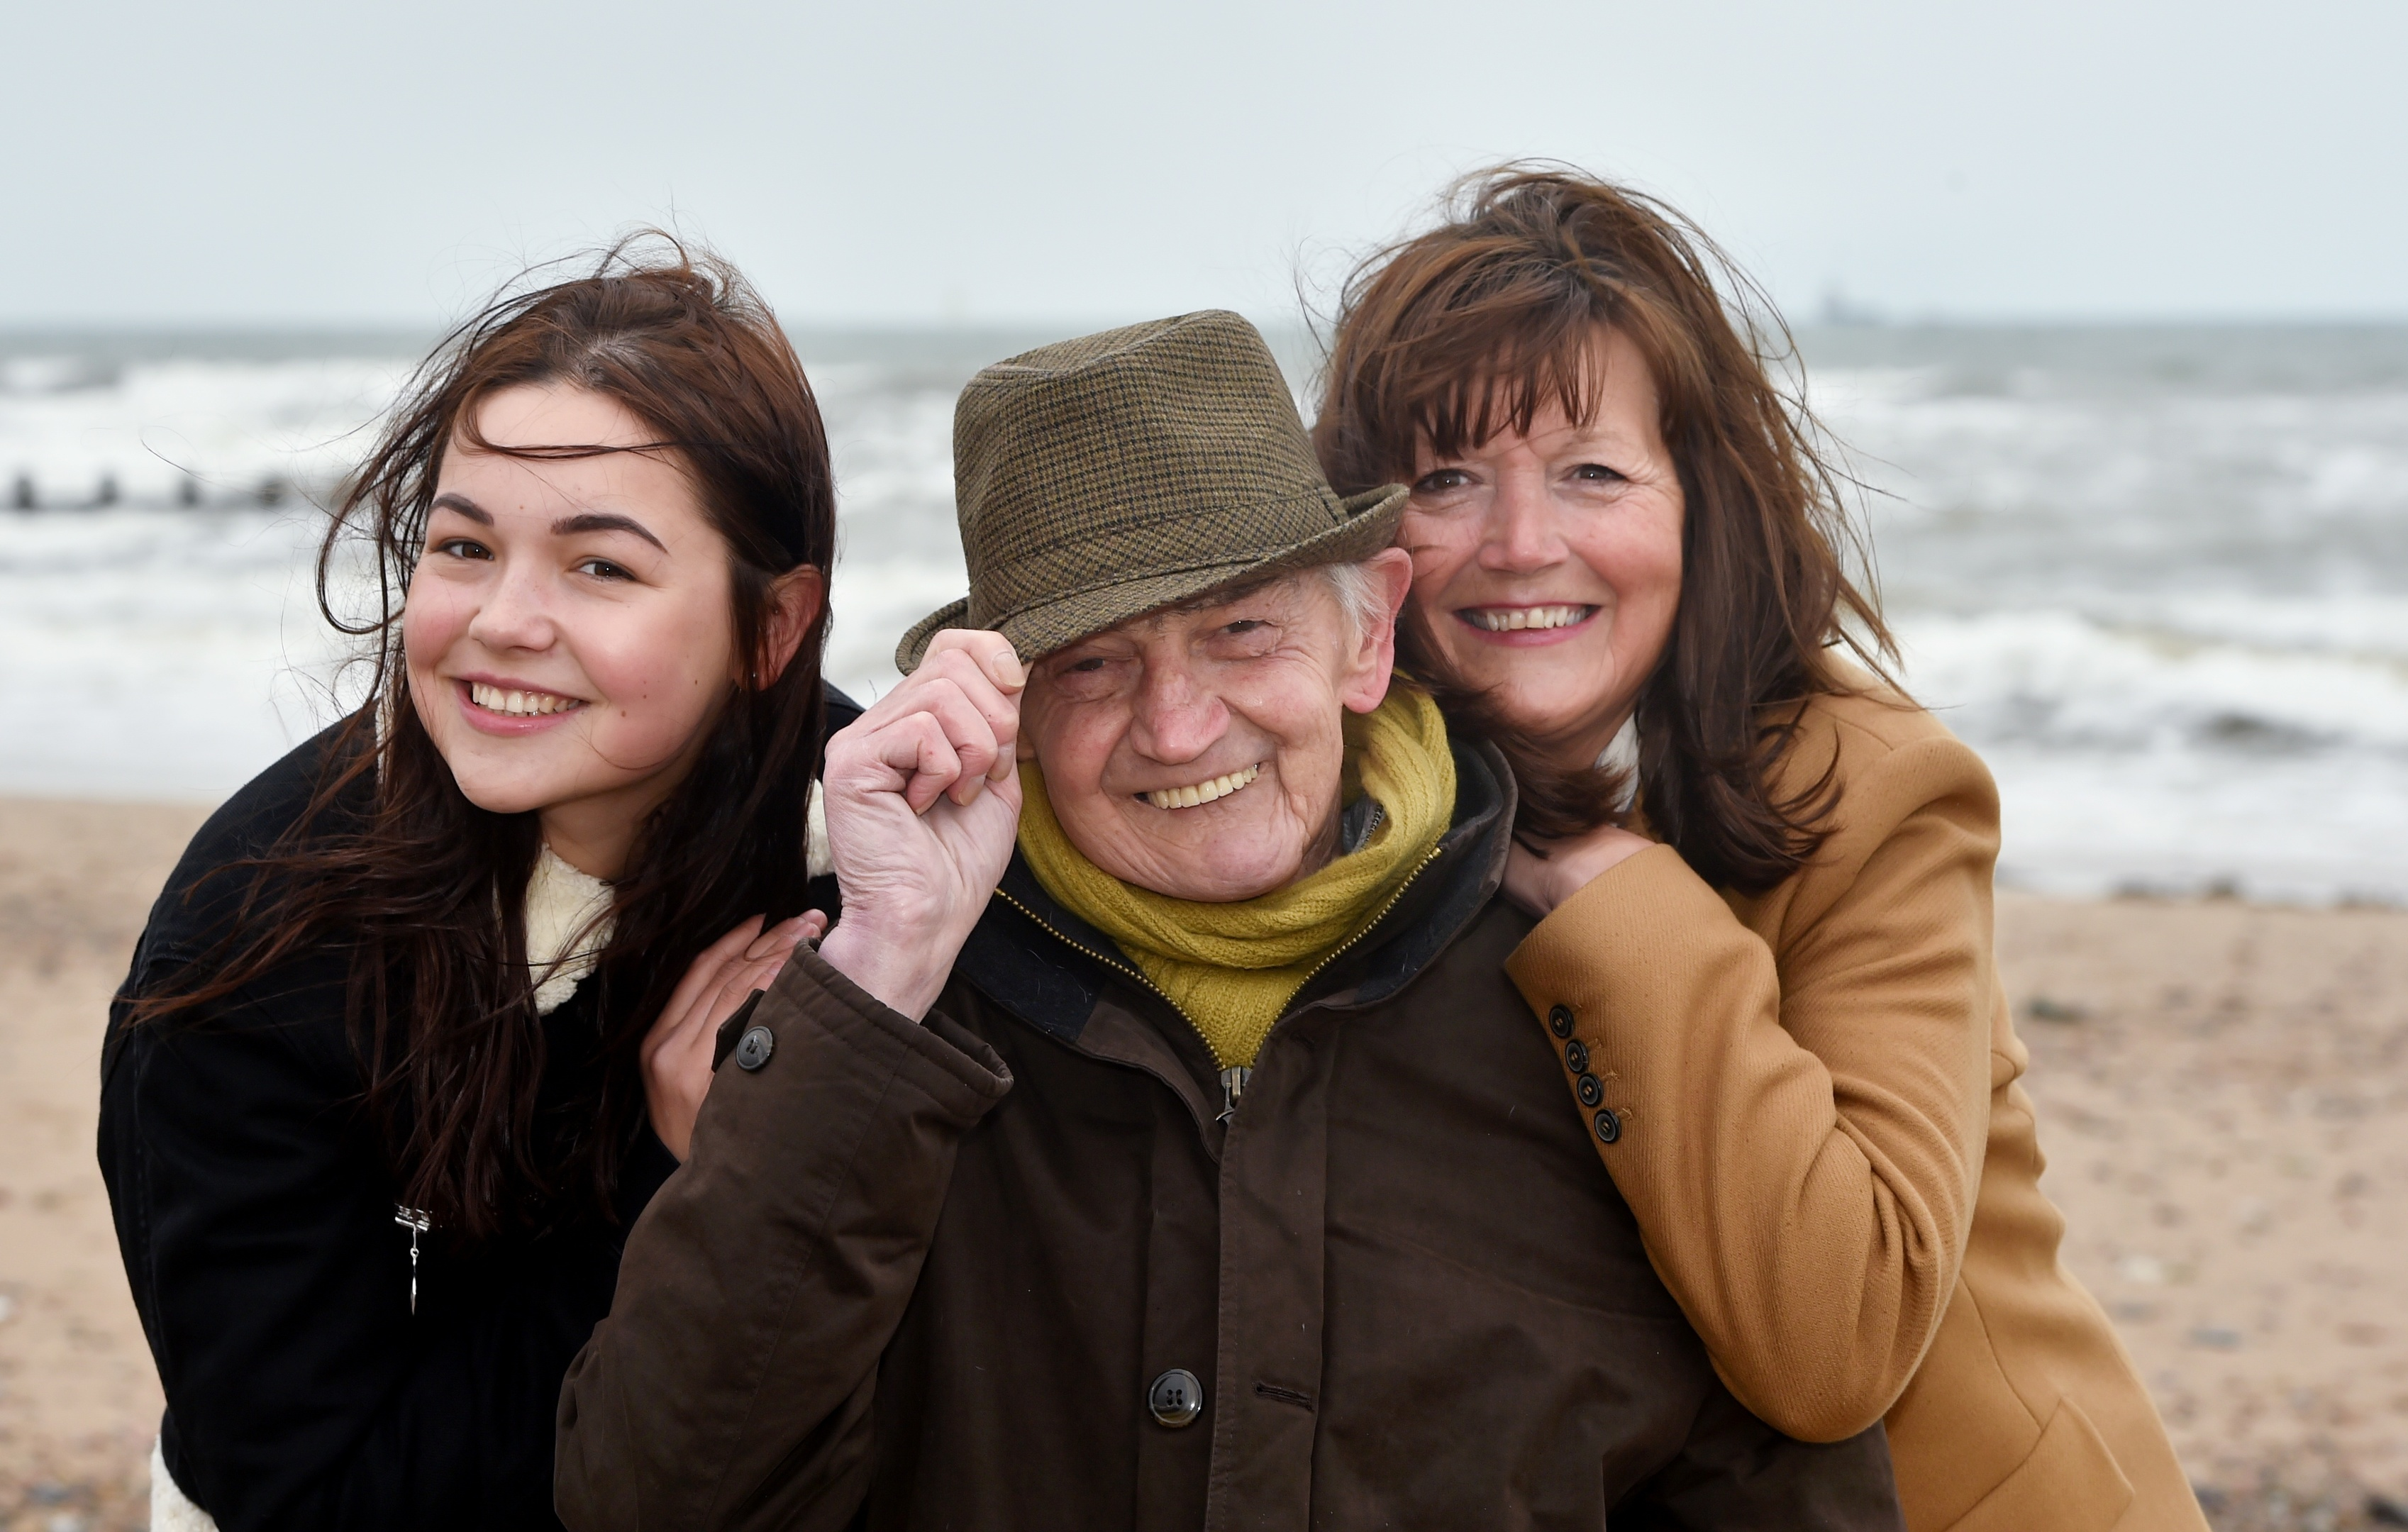 Brave model Joe McGunnigle with daughter Karen Sedgwick and grandaughter Cassie McGunnigle. Picture by Colin Rennie.